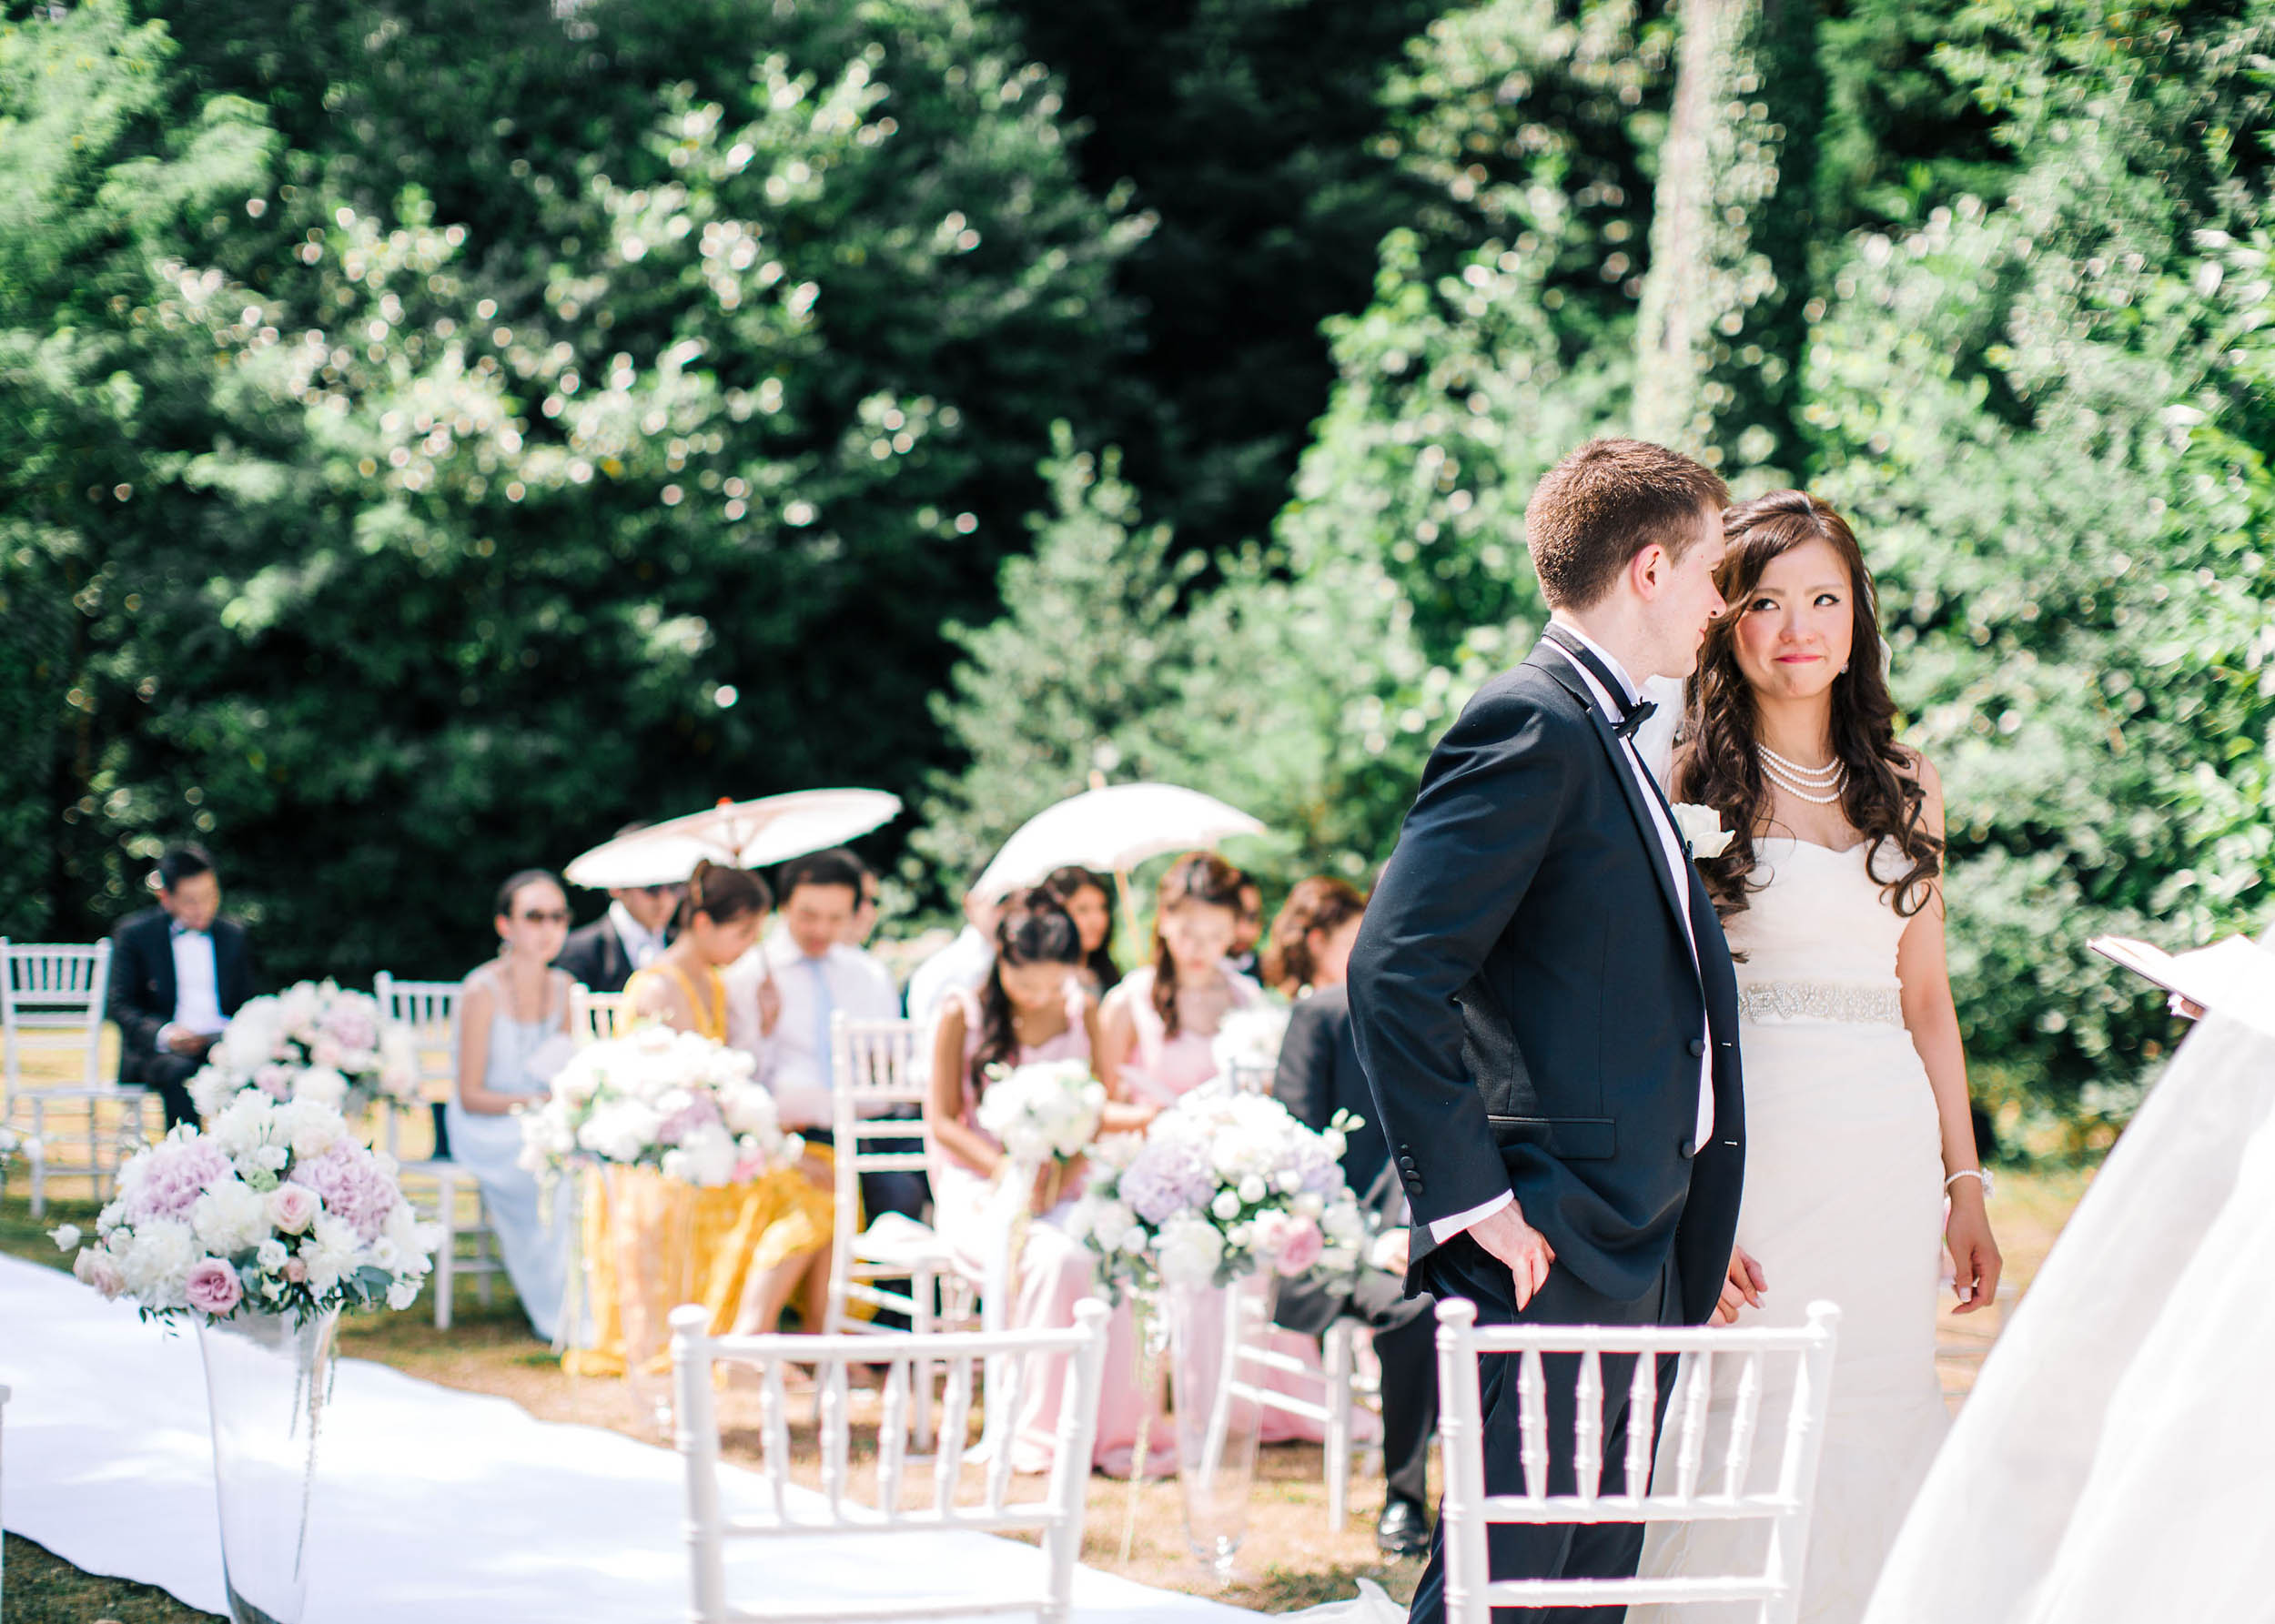 Amy O'Boyle Photography- Destination & UK Fine Art Film Wedding Photographer- Chateau La Durantie Wedding-14.jpg